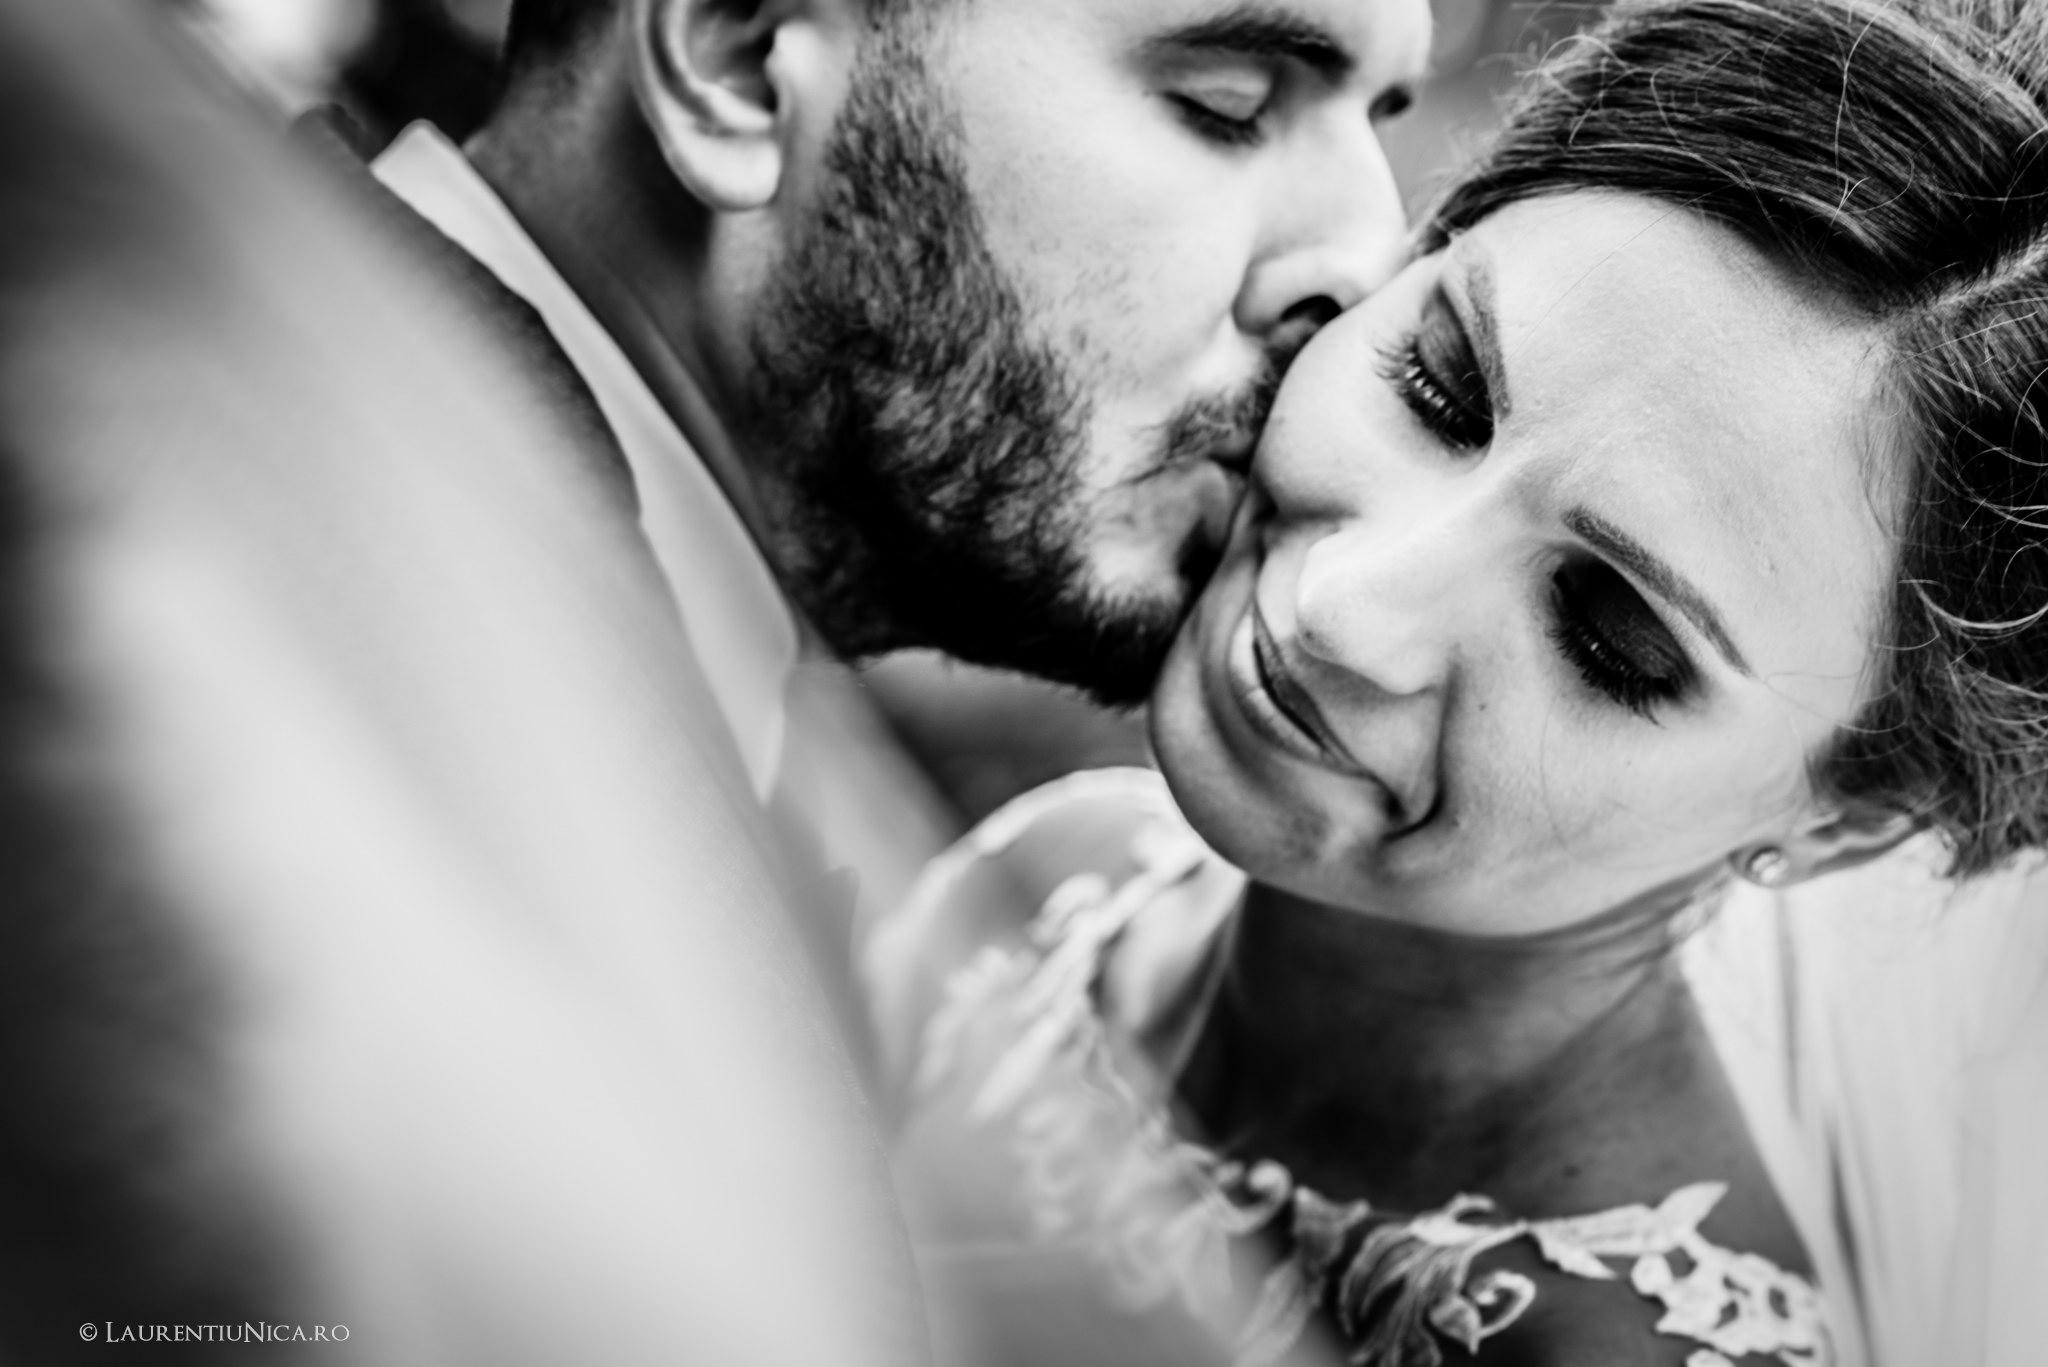 andreea si alin fotografii after wedding balchik bulgaria08 - Andreea & Alin | Fotografii After Wedding | Balchik Bulgaria